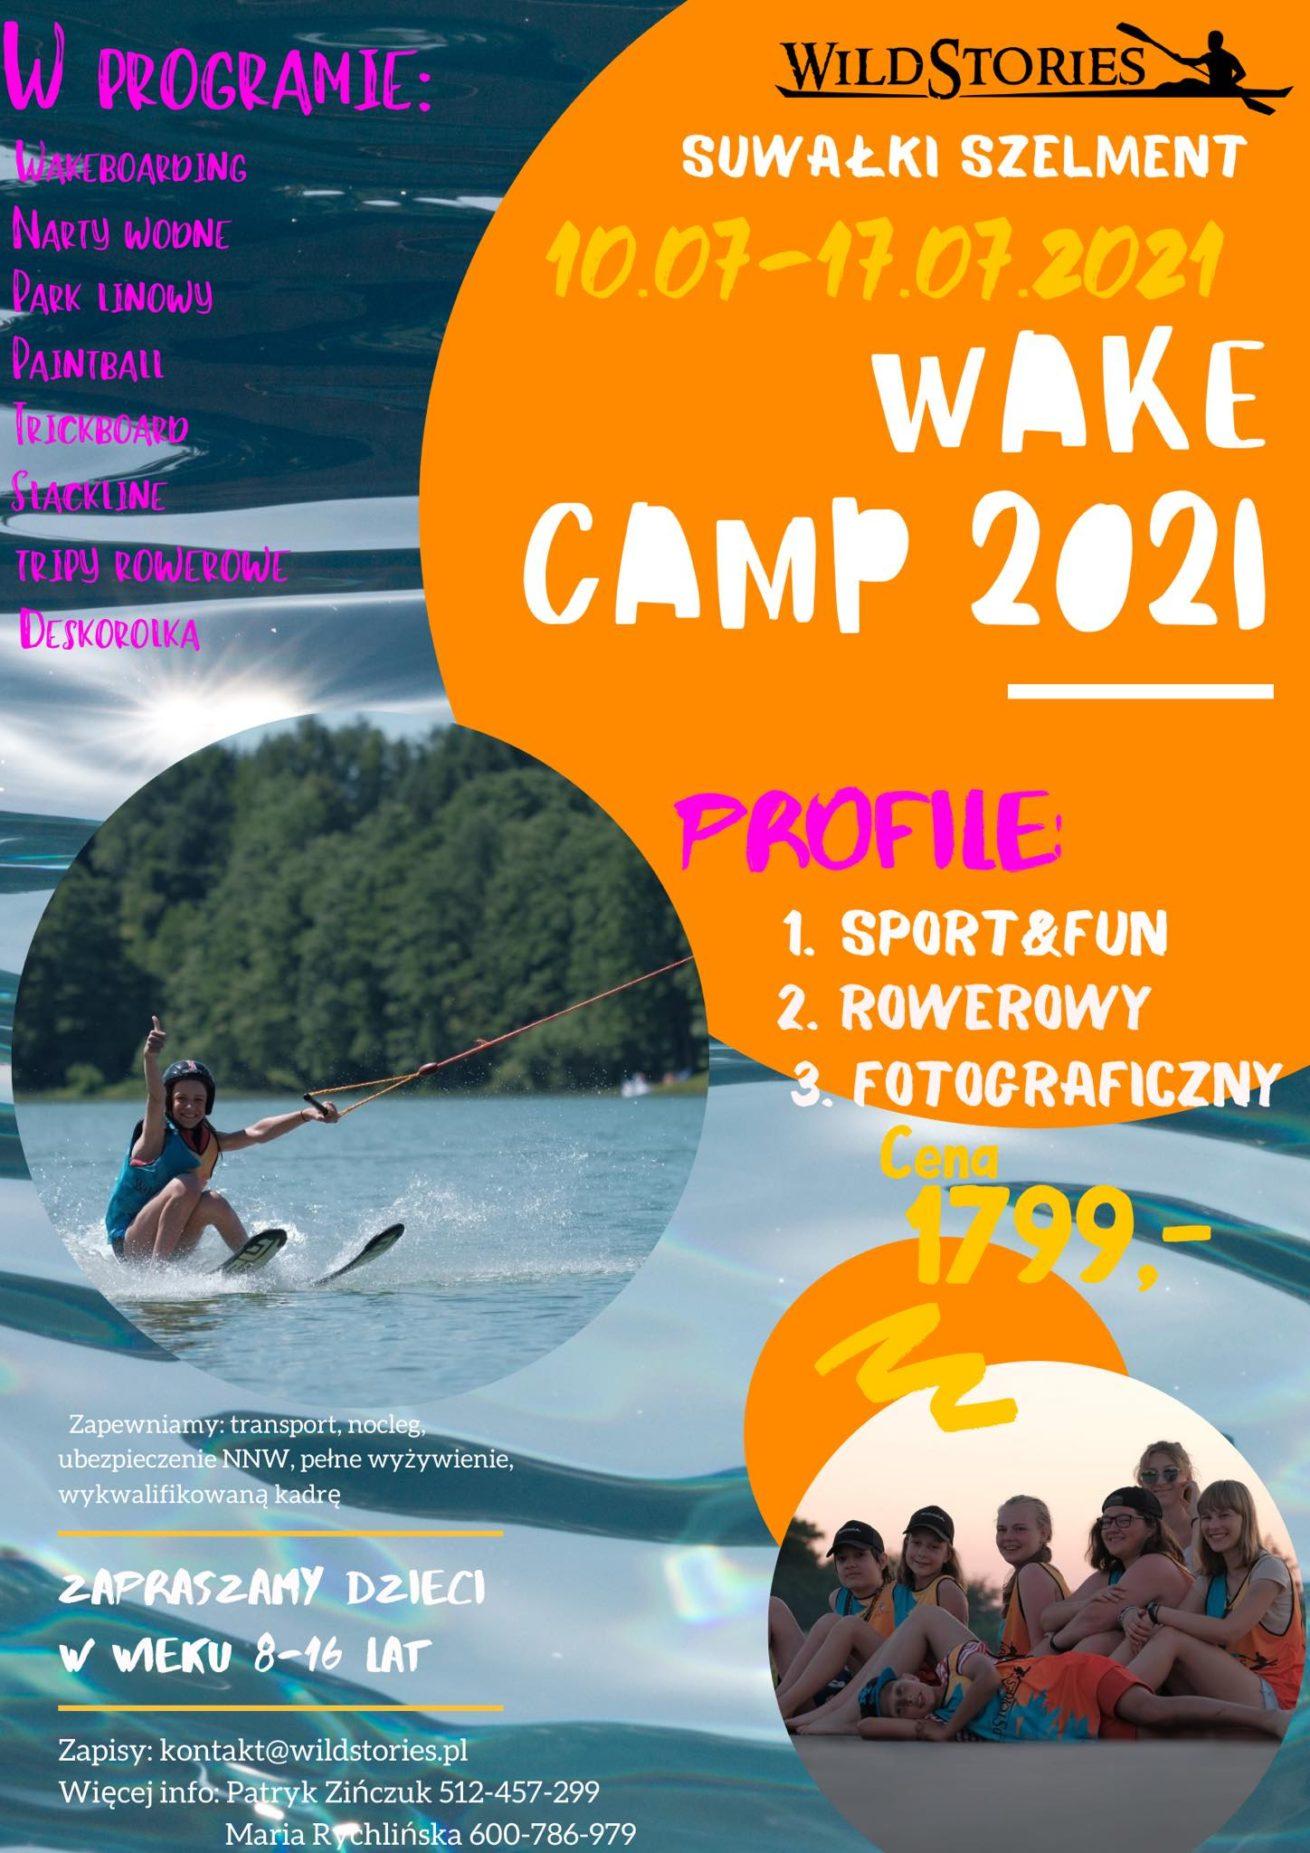 Wake Camp 2021